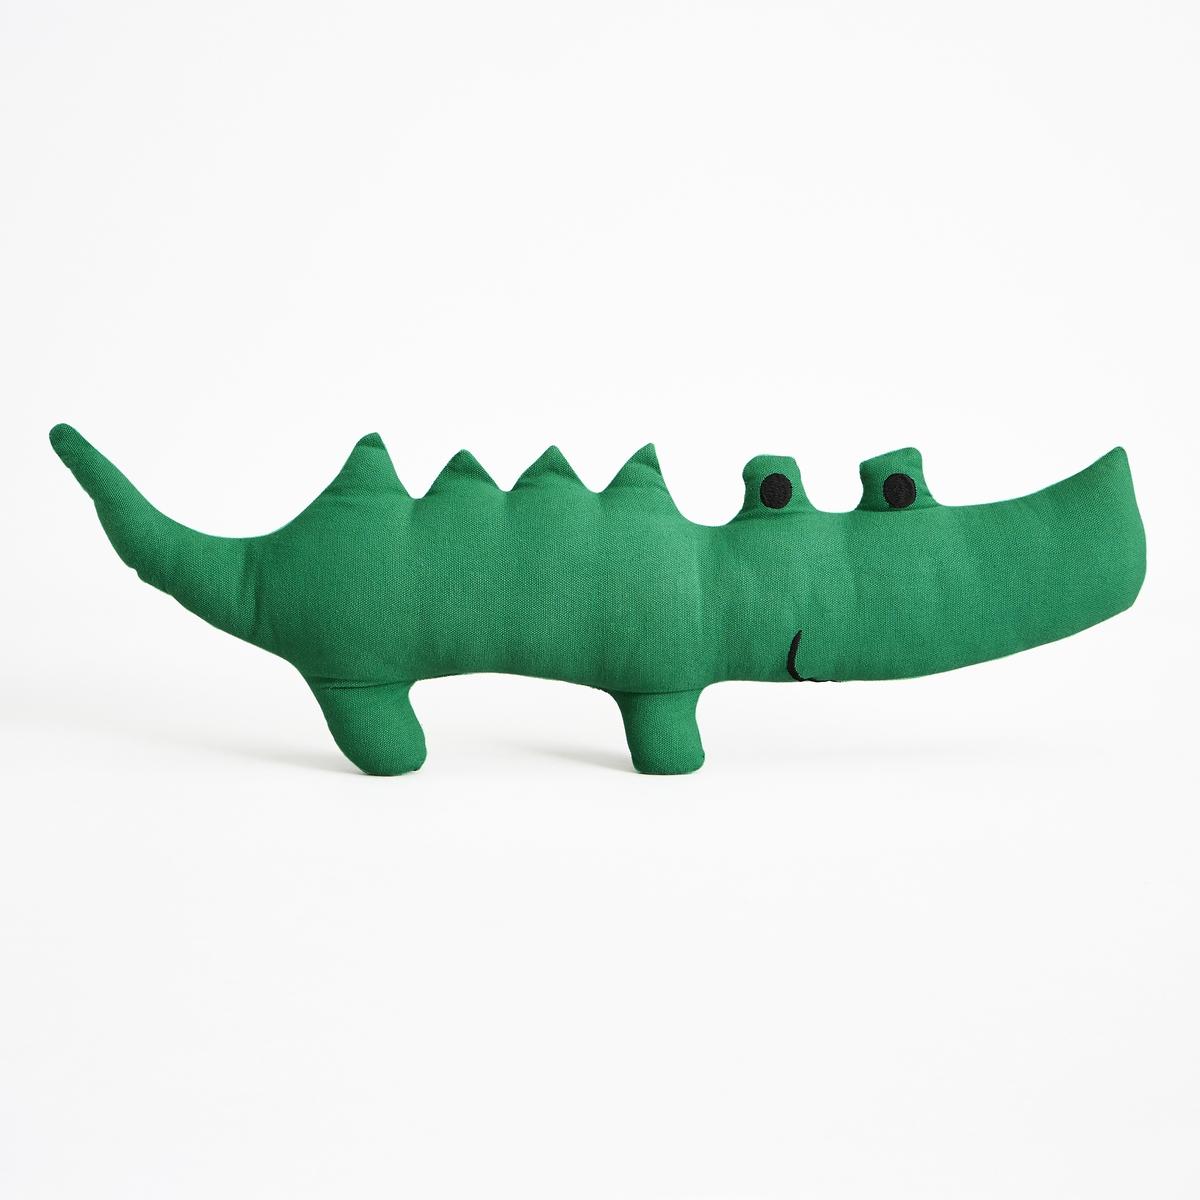 Подушка в форме крокодила Pacheco